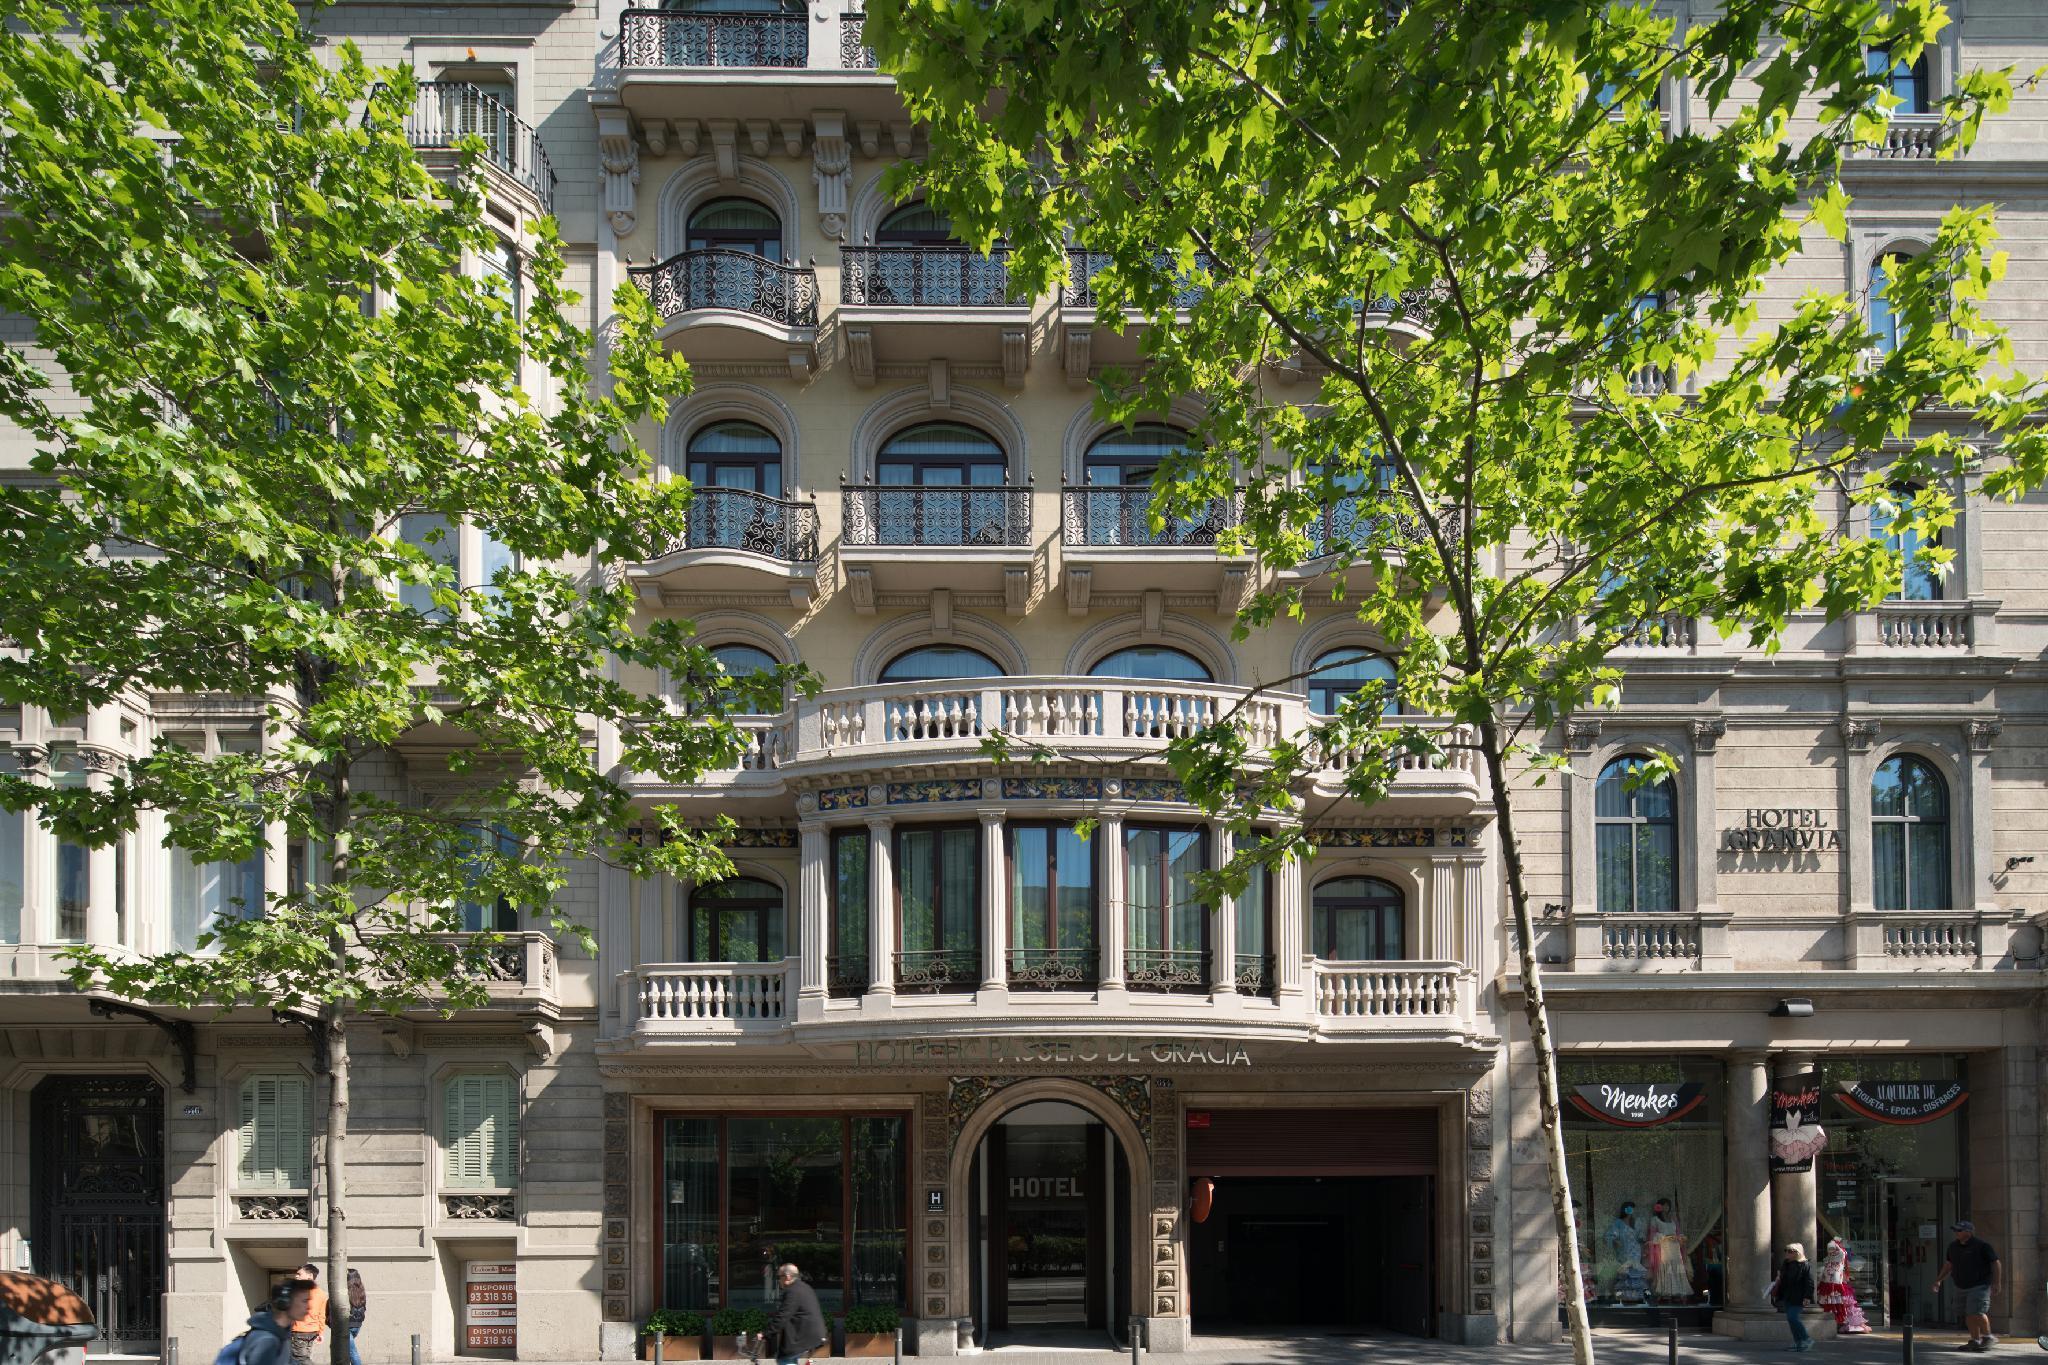 Hotel Catalonia Passeig de Gracia